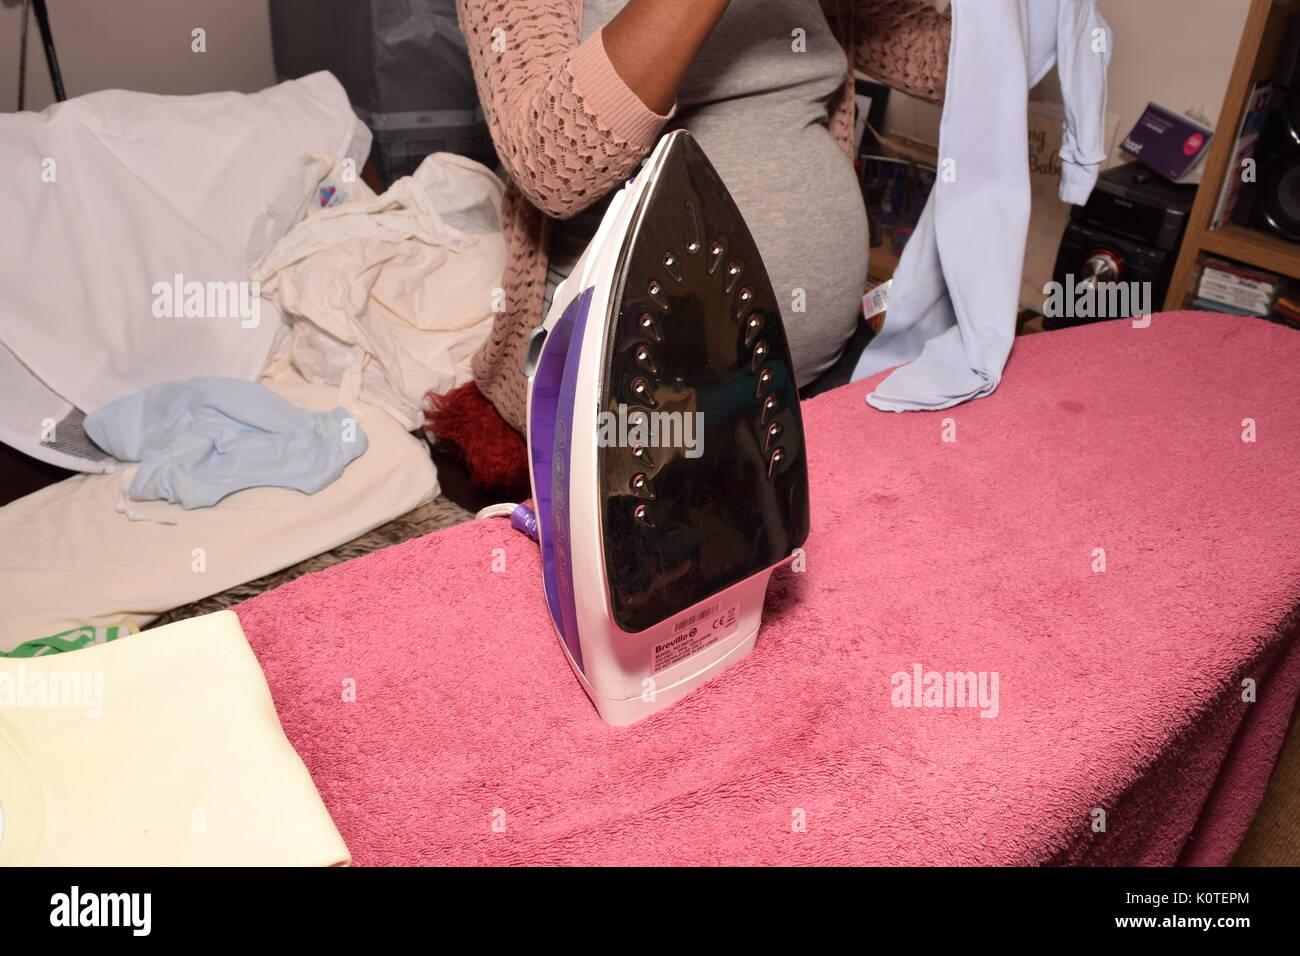 Pregnant woman ironing - Stock Image